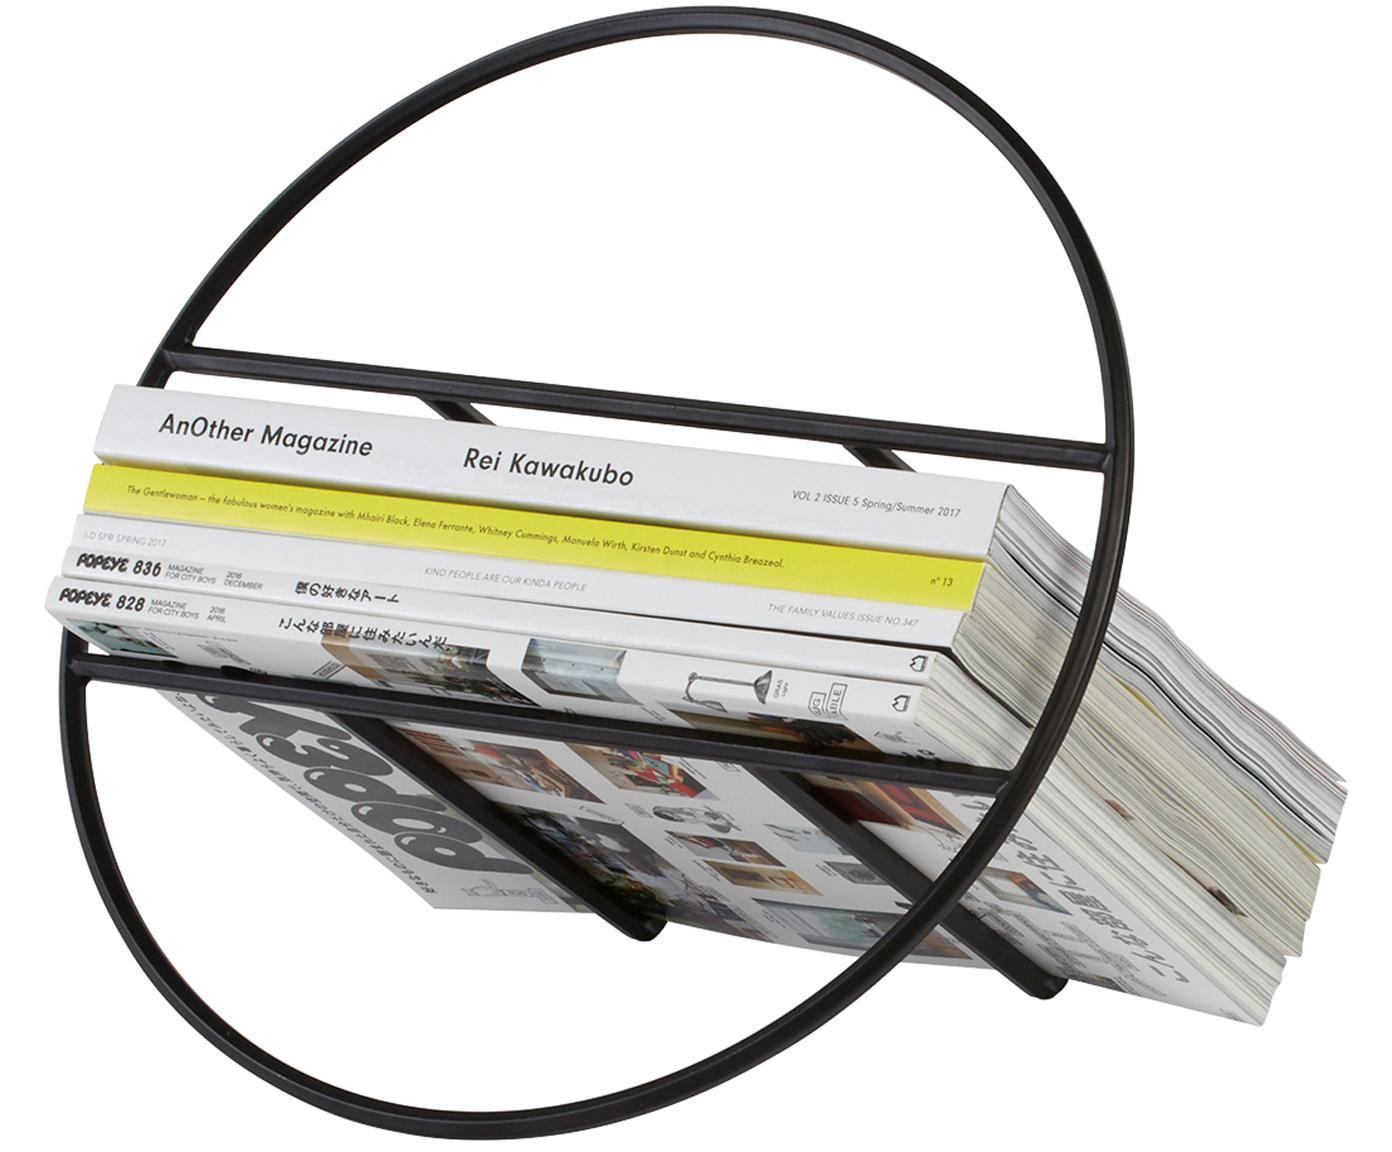 Zeitschriftenhalter Hoop, Metall, lackiert, Schwarz, Ø 35 x H 21 cm